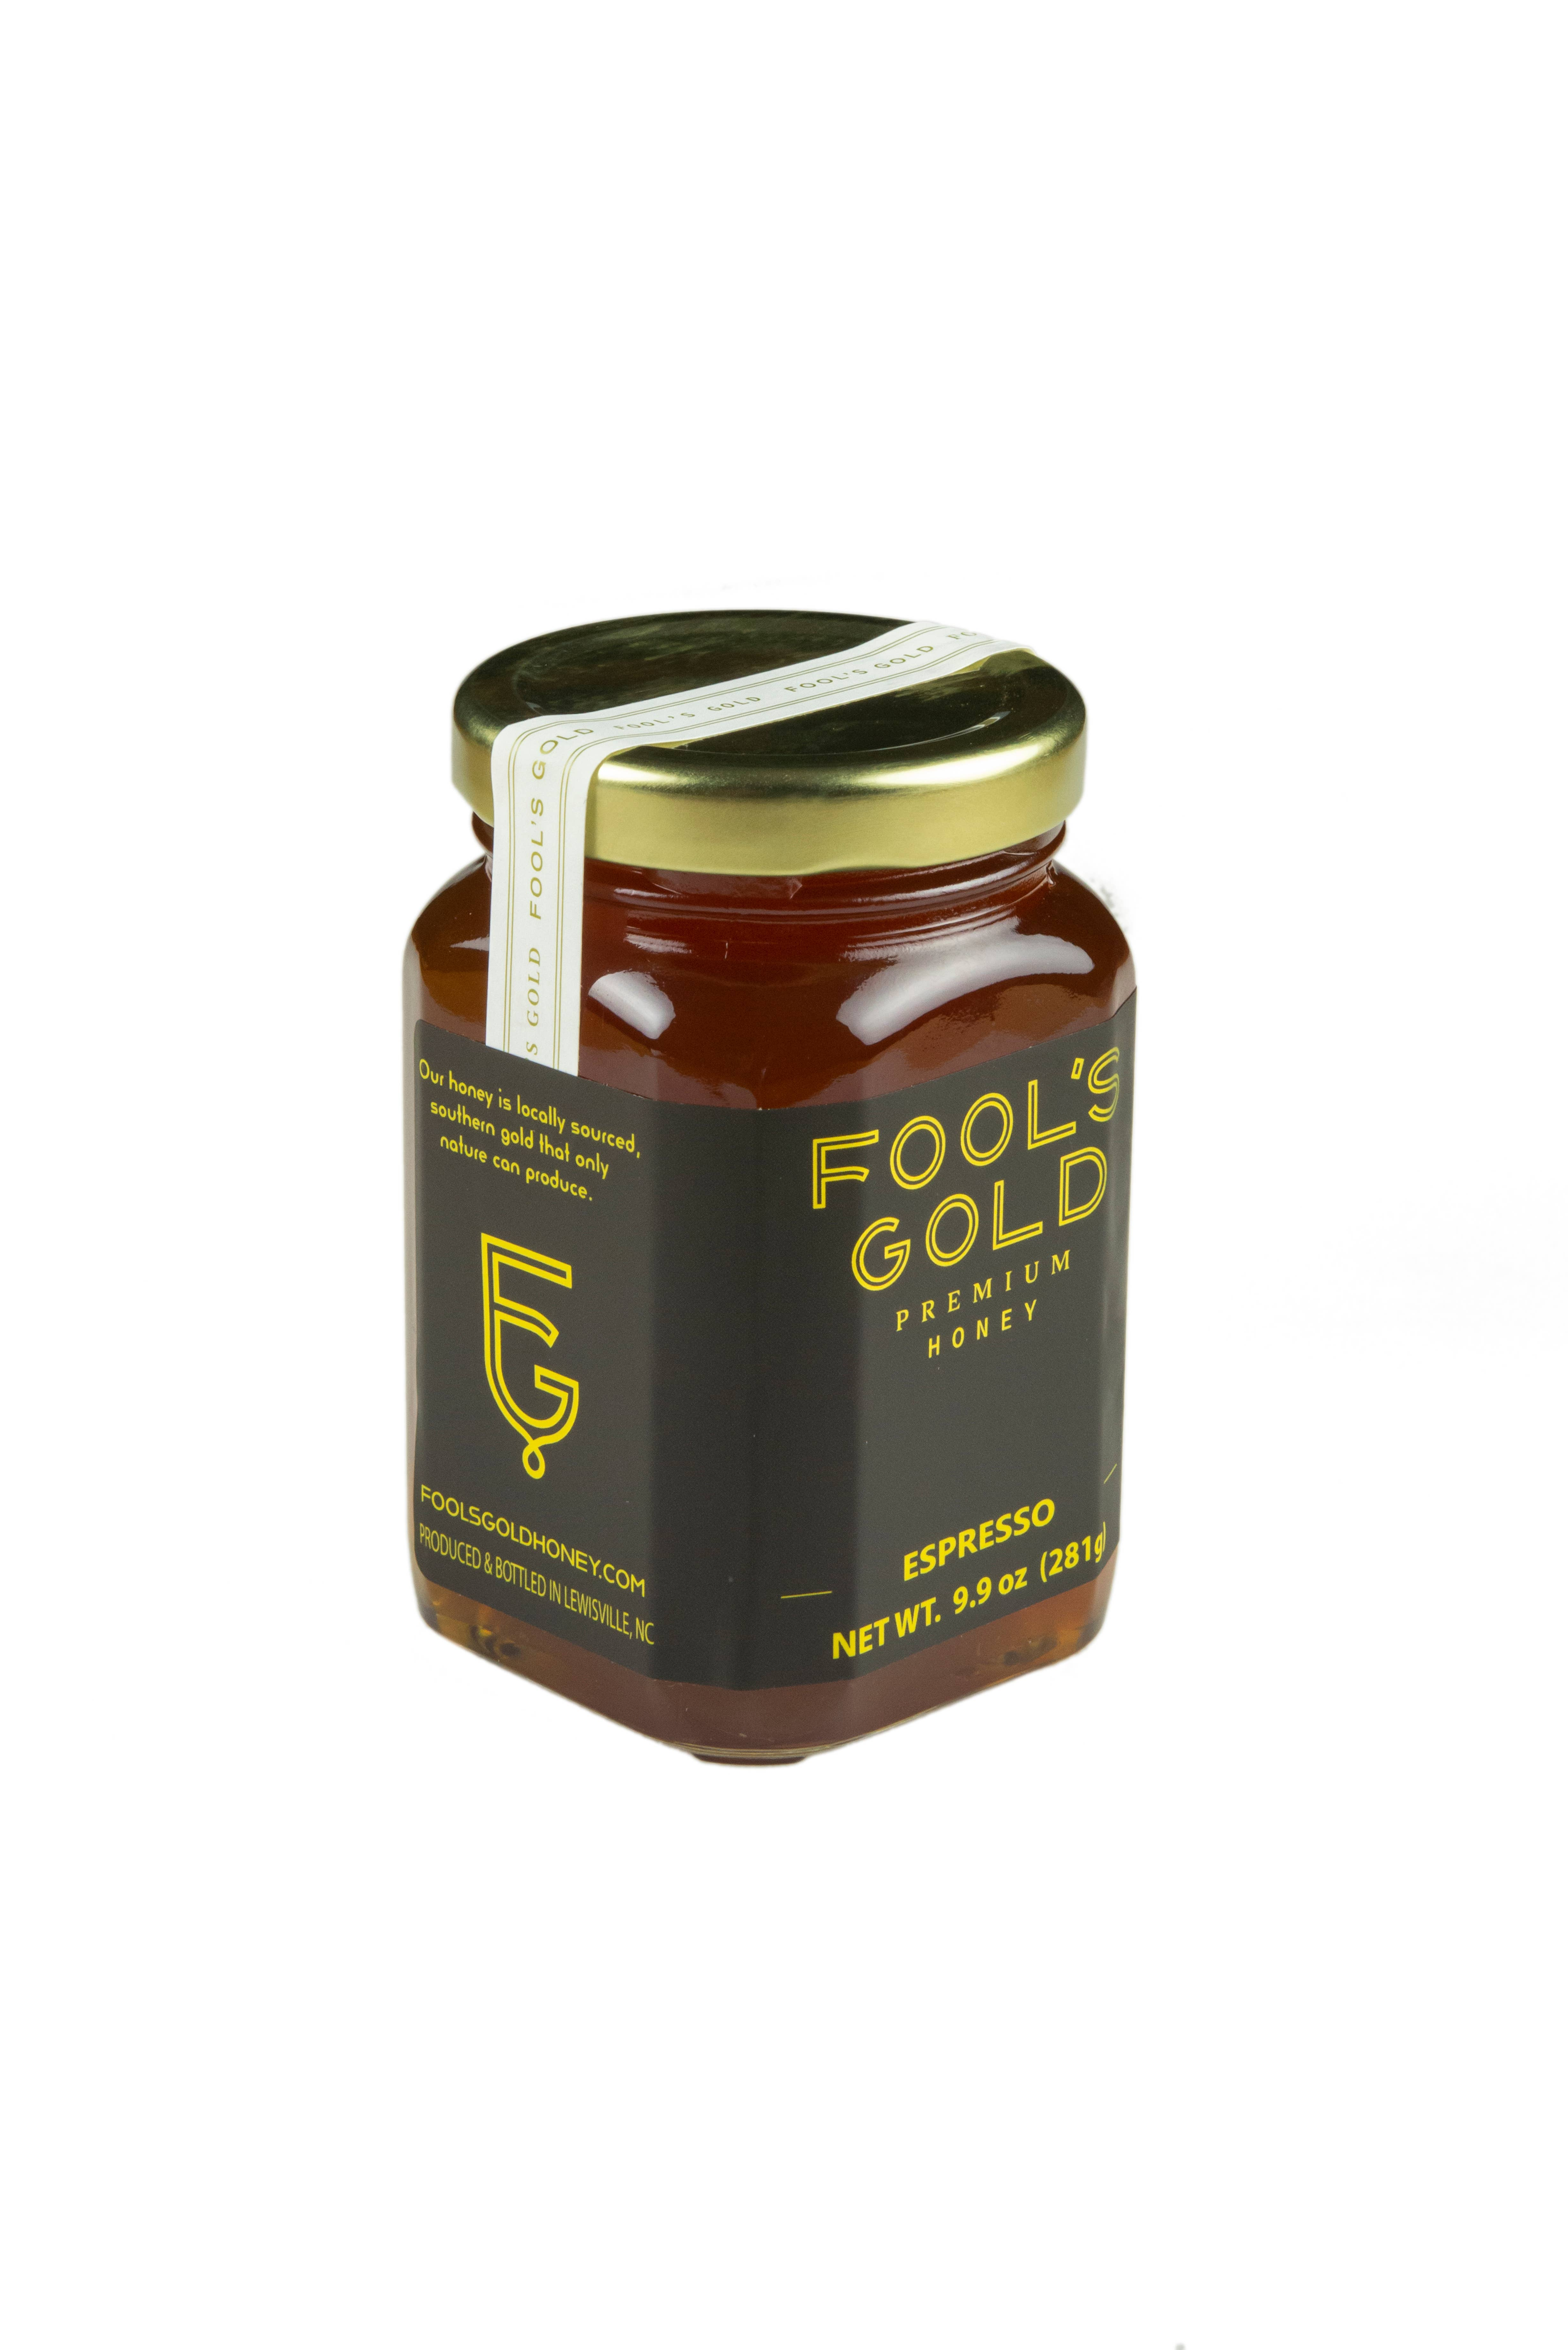 9.9oz Espresso Infused Honey | Trada Marketplace